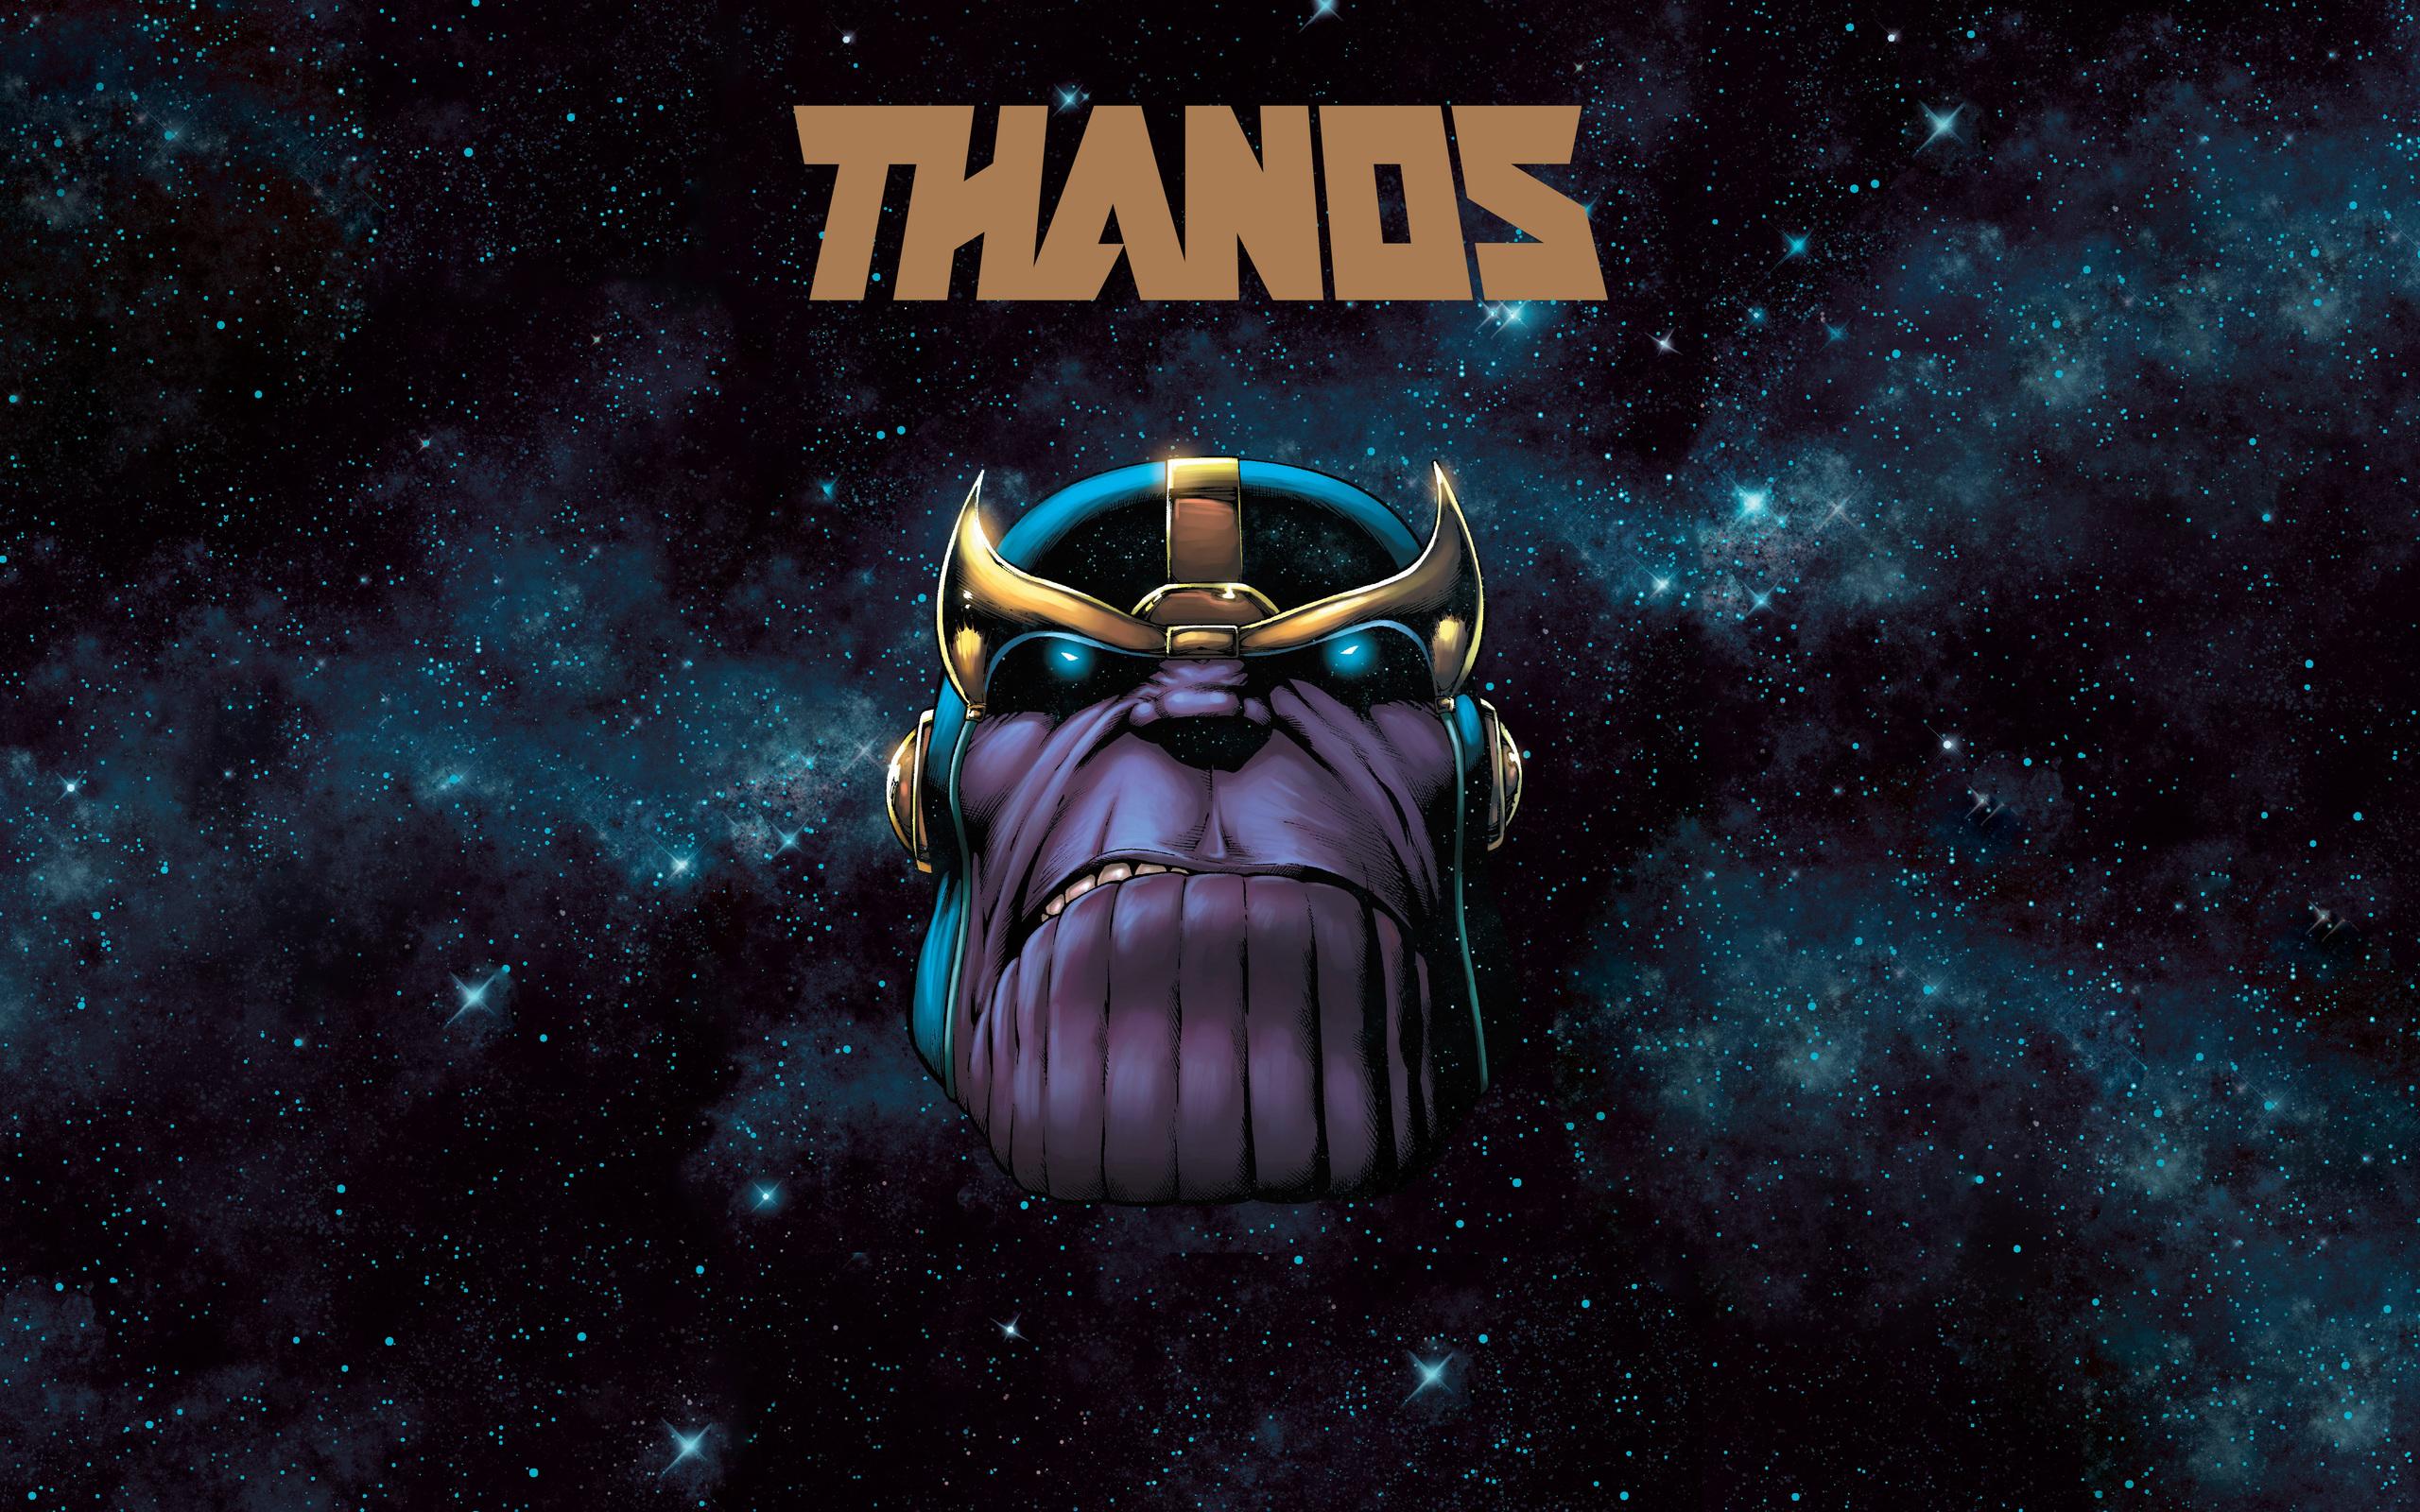 Thanos 5k - Thanos 5k - Wallpapers, 4k